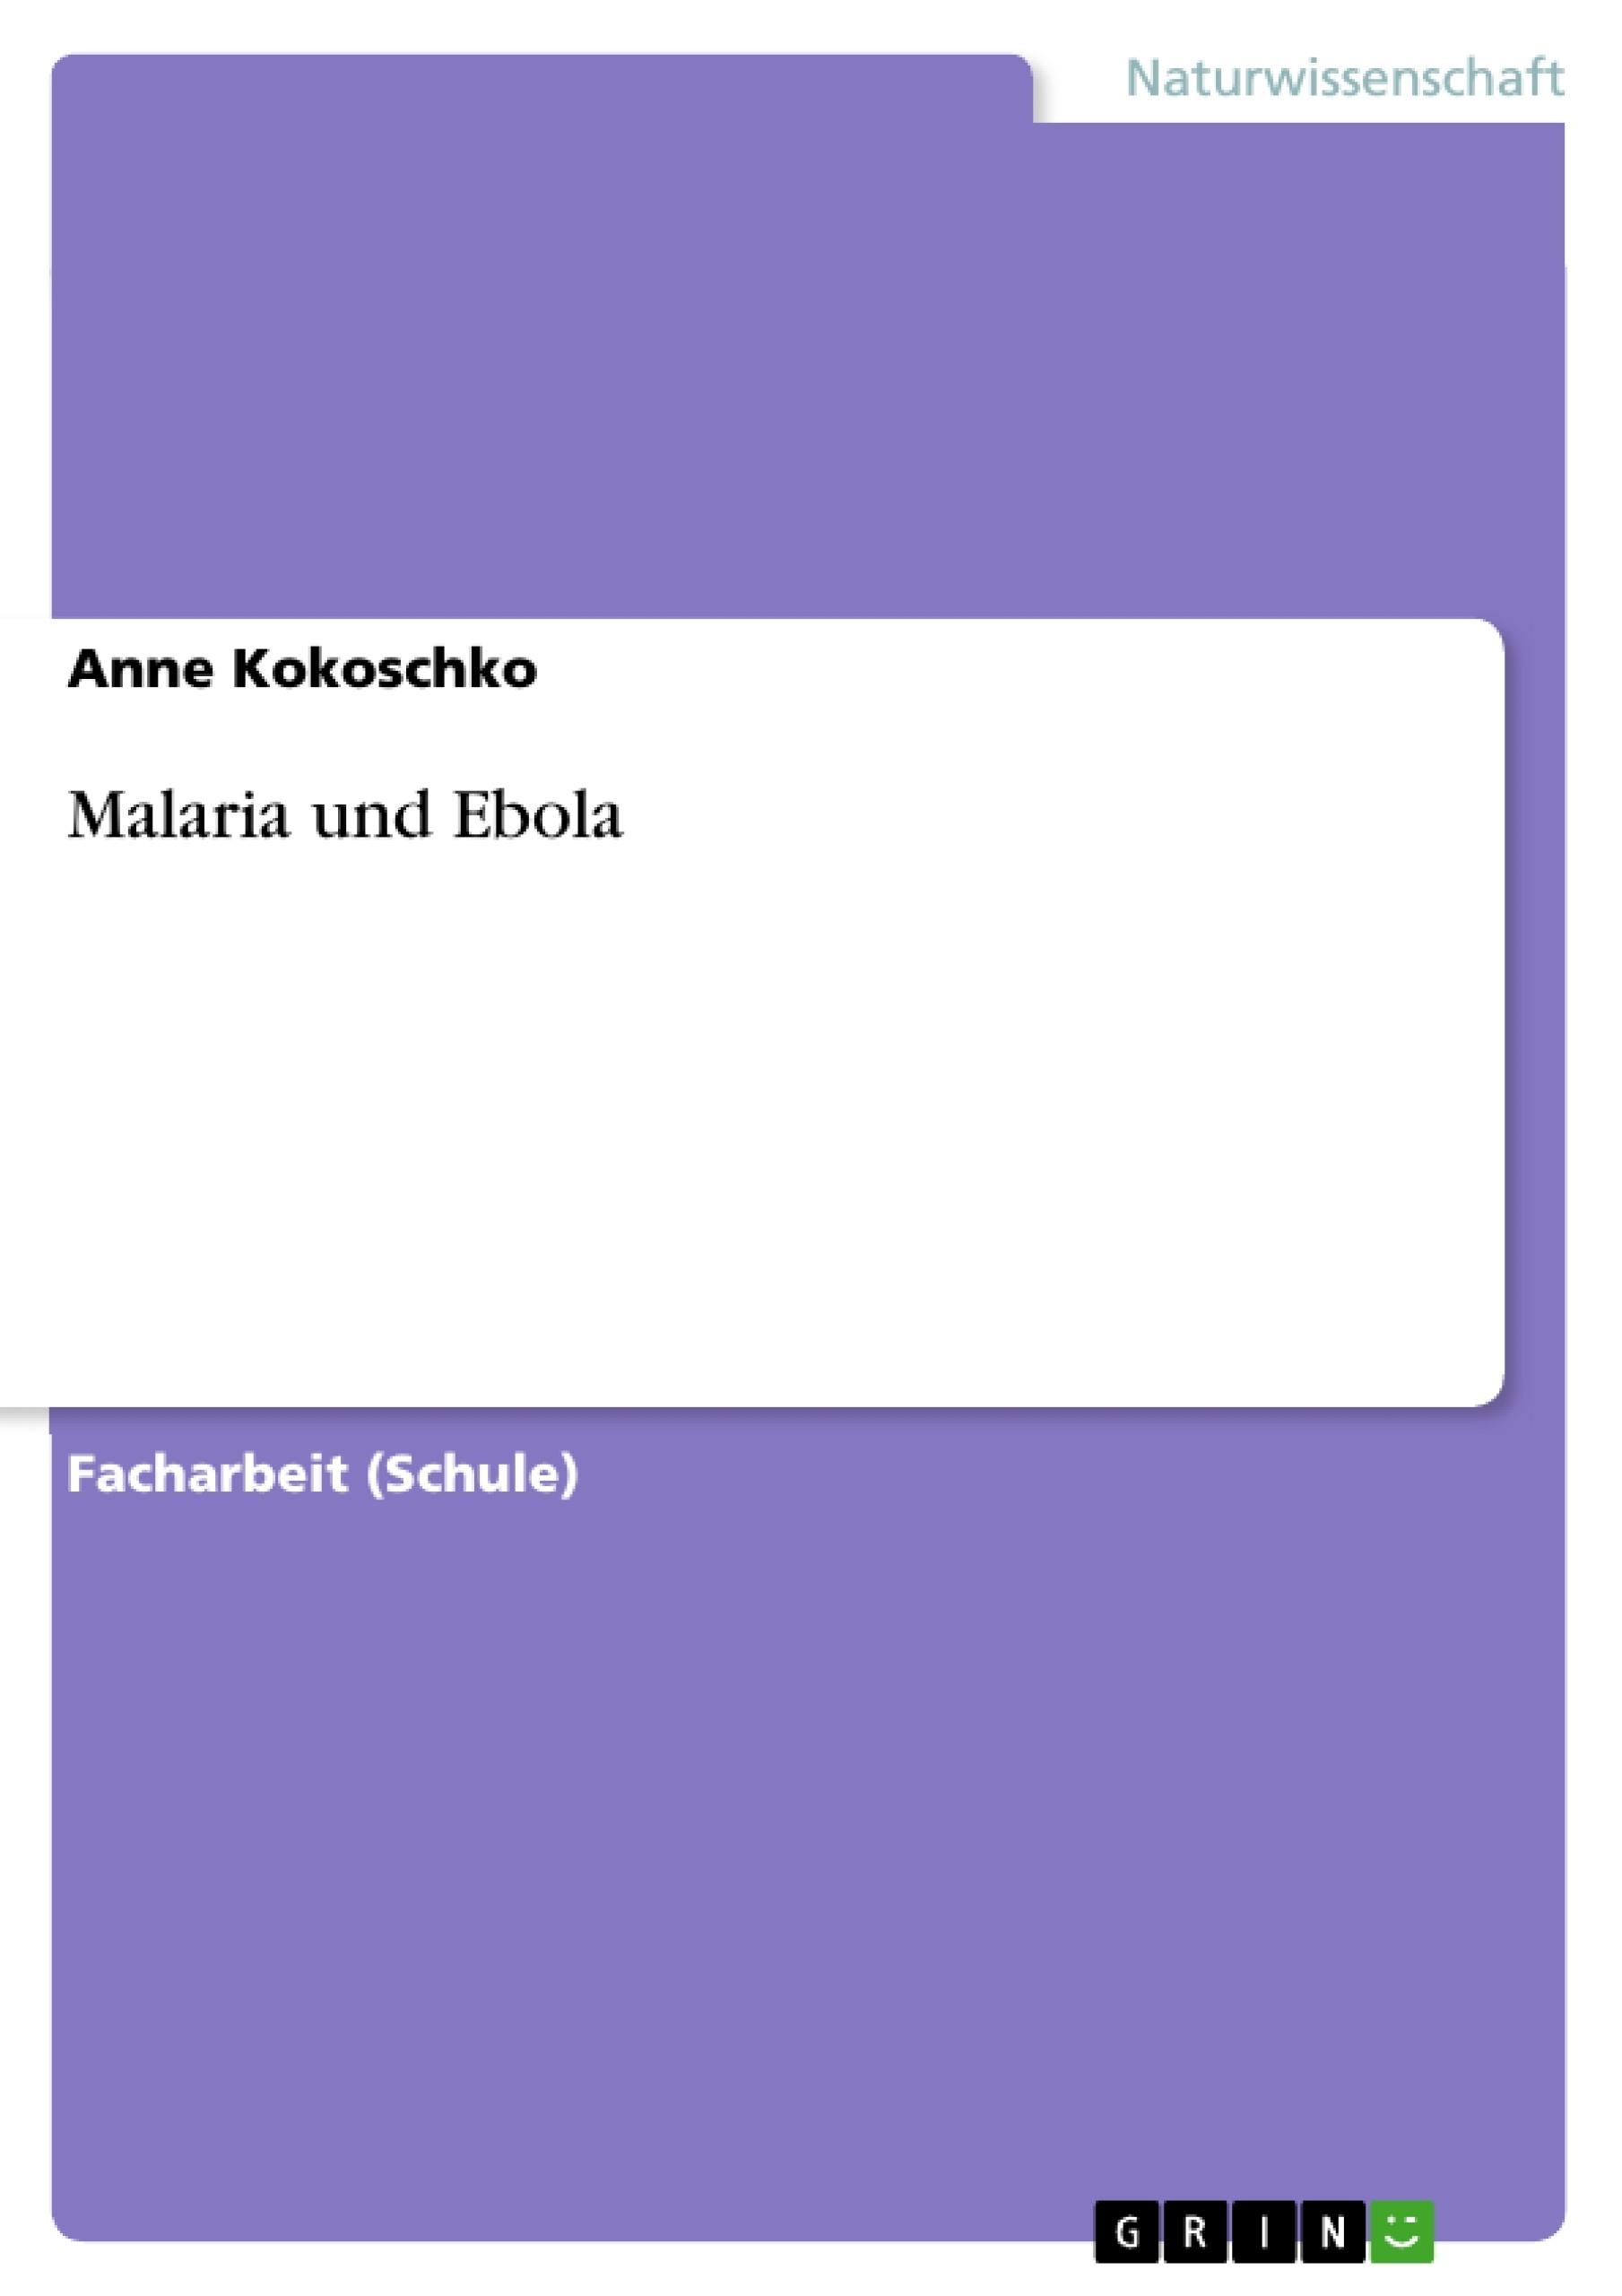 Titel: Malaria und Ebola